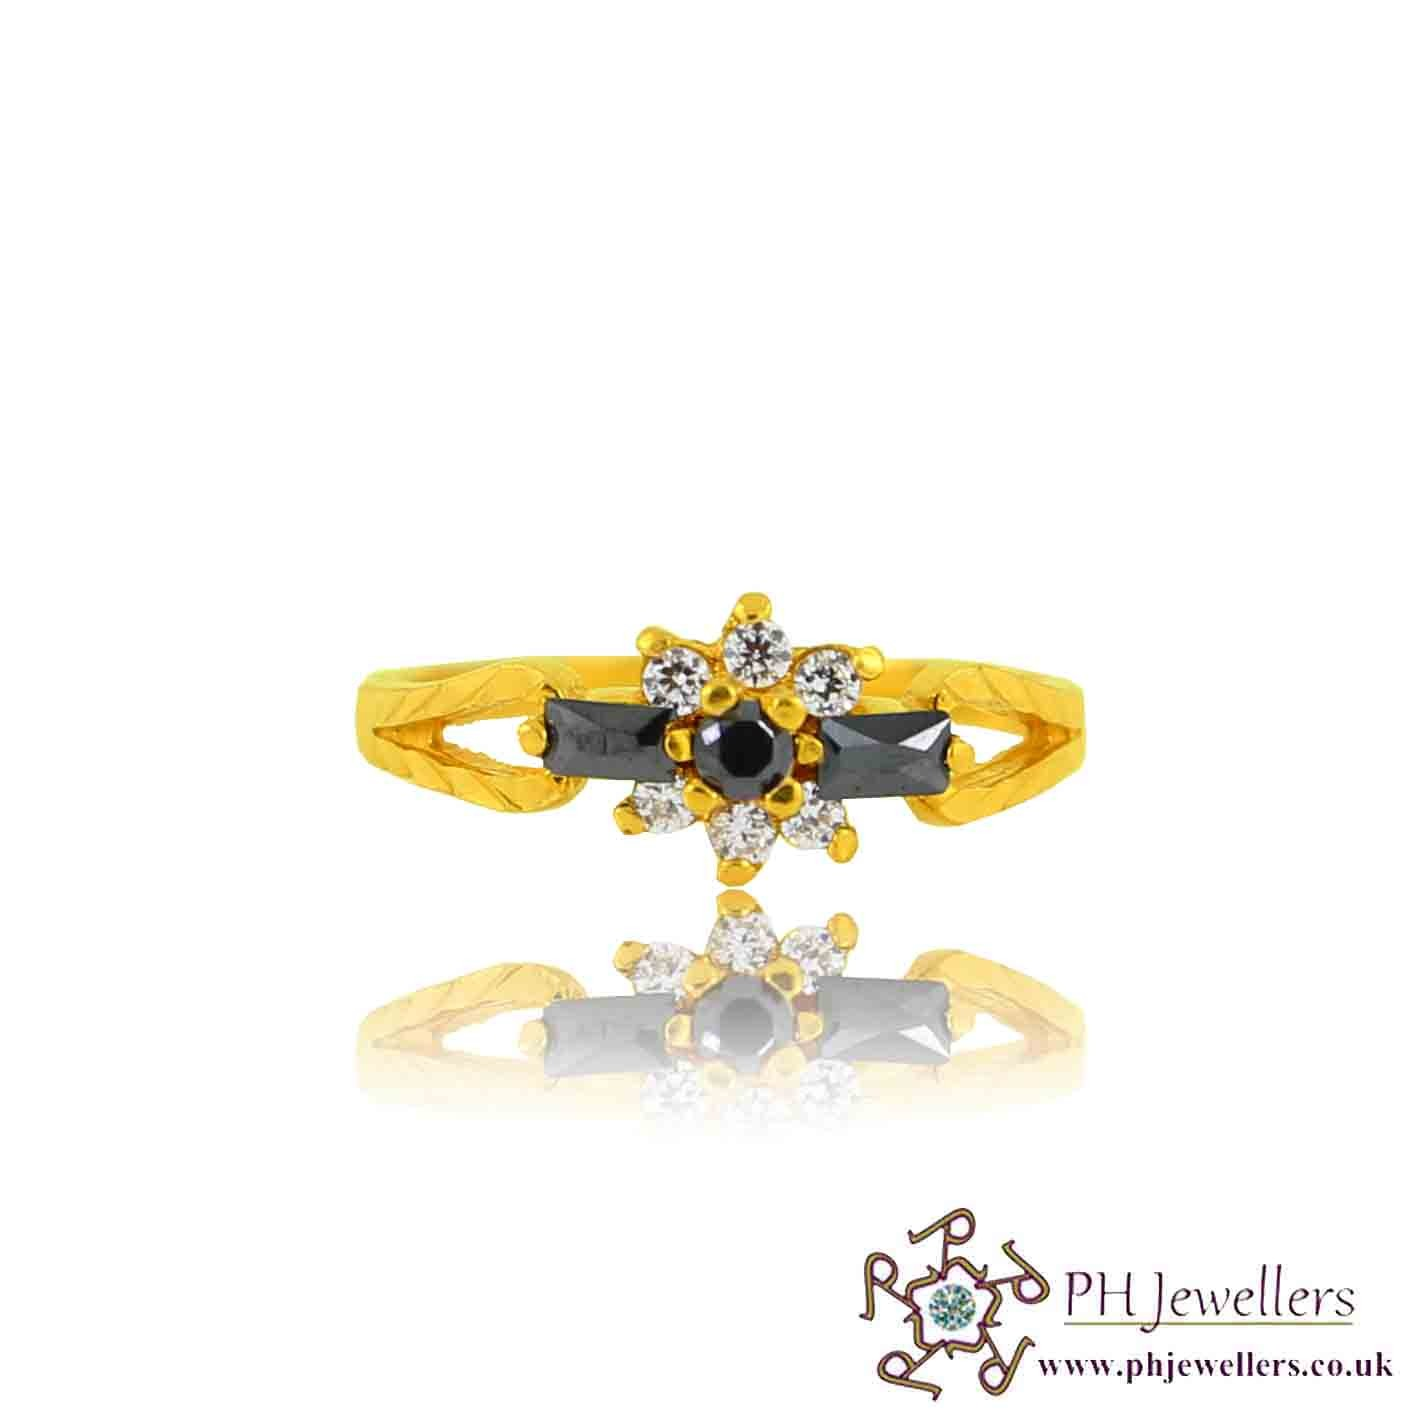 22ct 916 Yellow Gold Hallmark Black Ring CZ Size L SR121